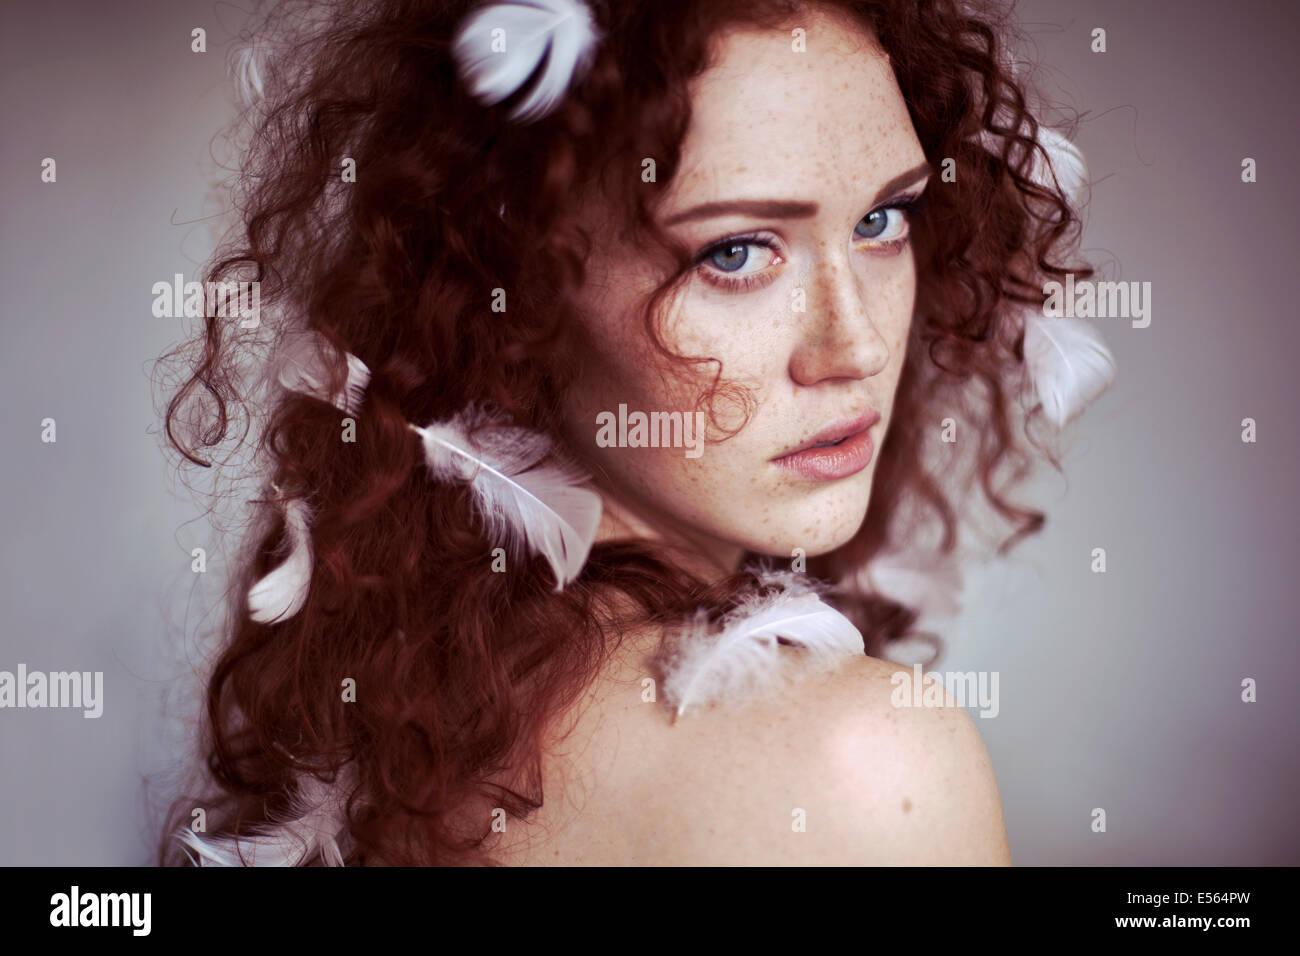 Junge Frau mit Federn im Haar Stockbild